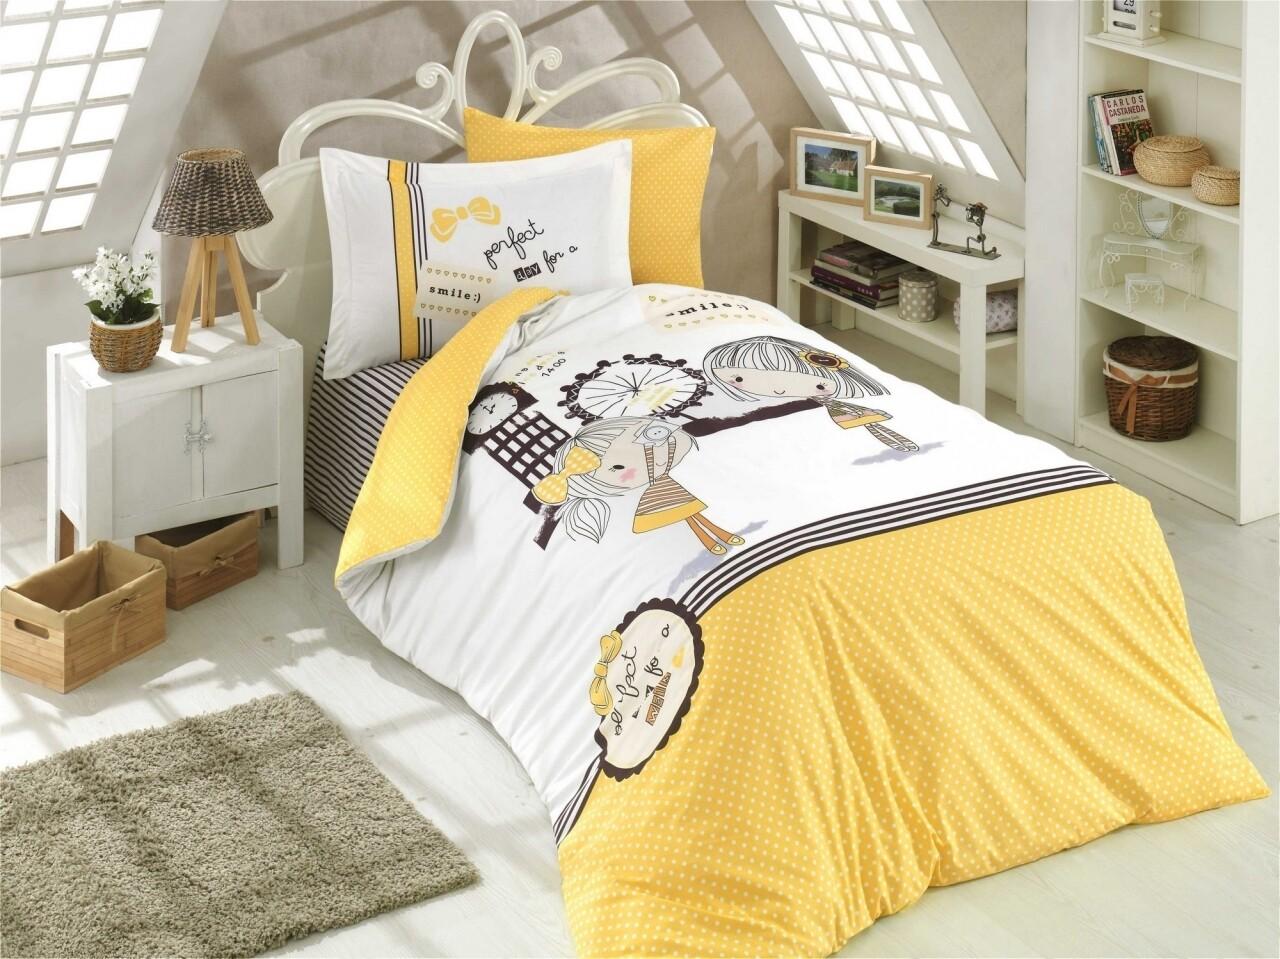 Lenjerie de pat pentru o persoana, Smile Yellow, Hobby, 3 piese, 160 x 240 cm, 100% bumbac poplin, alb/galben